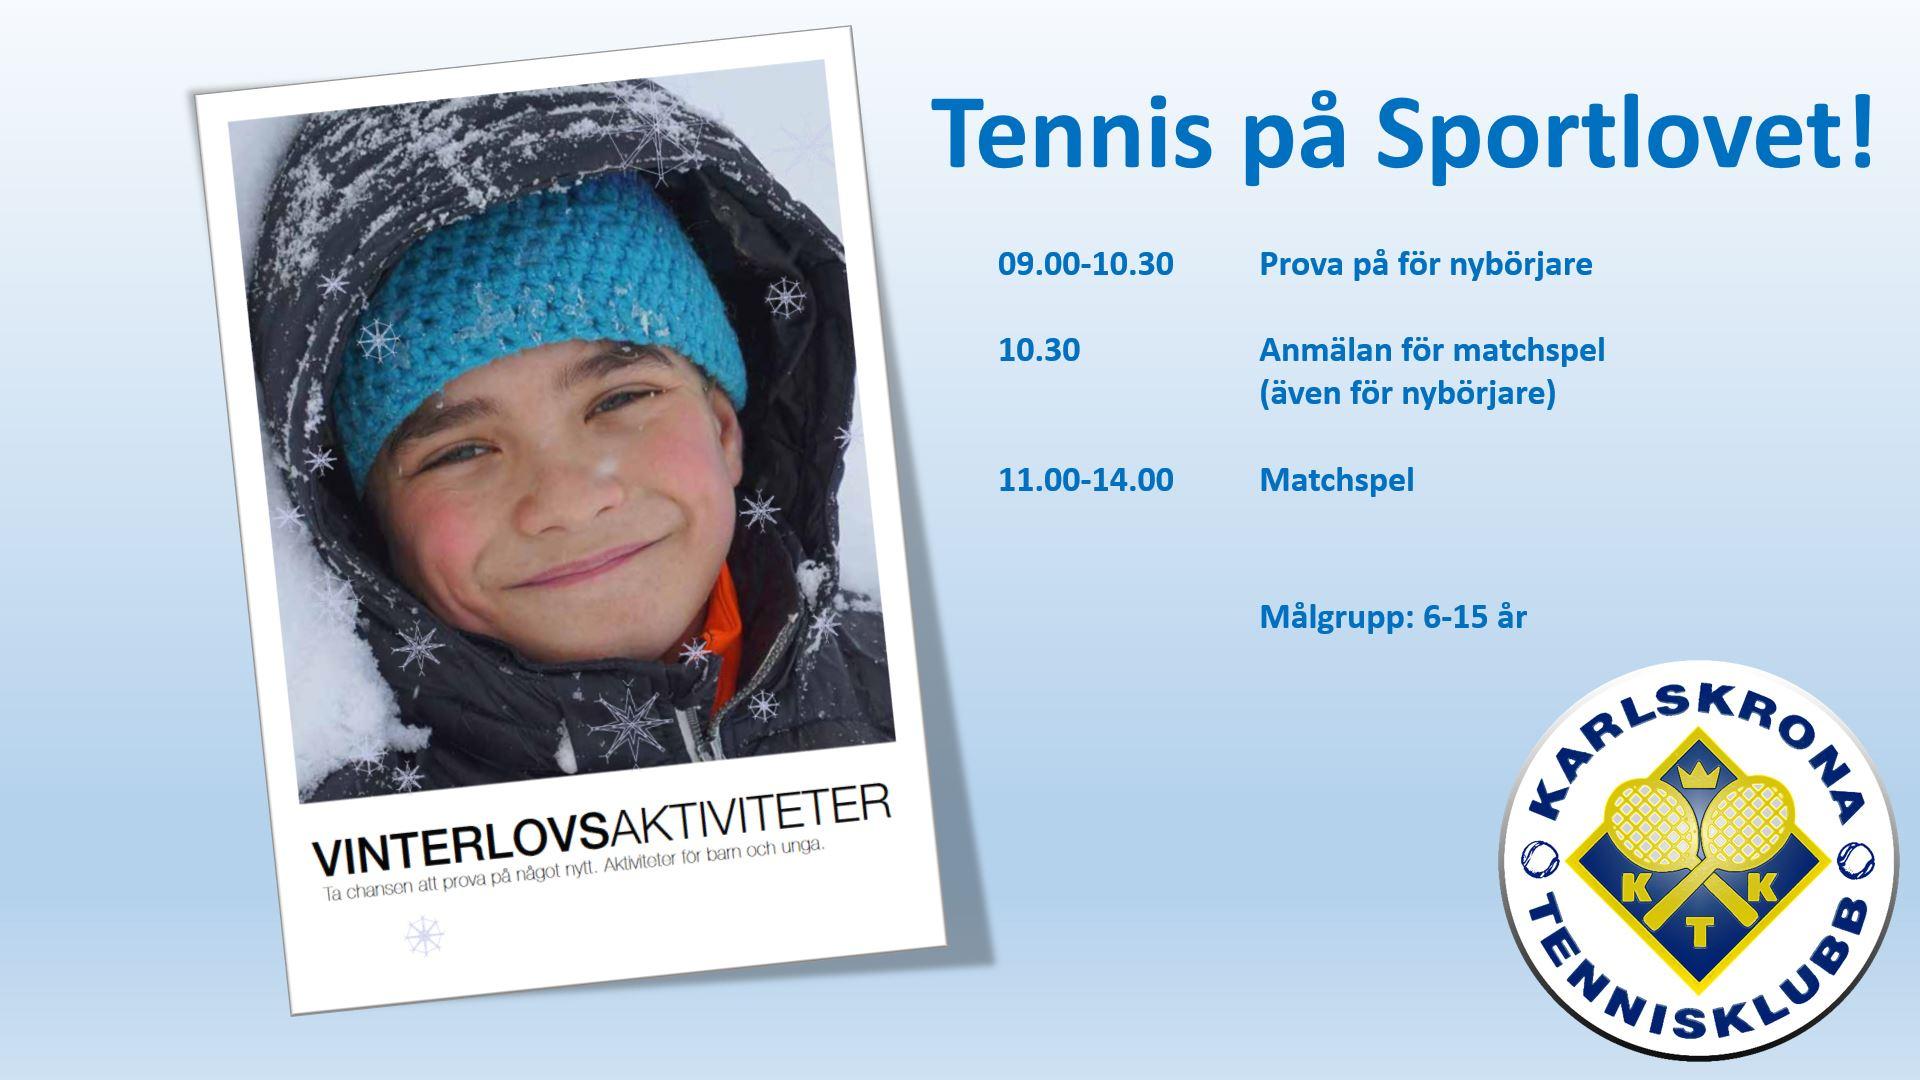 Vinterlovsaktivitet - Tennis